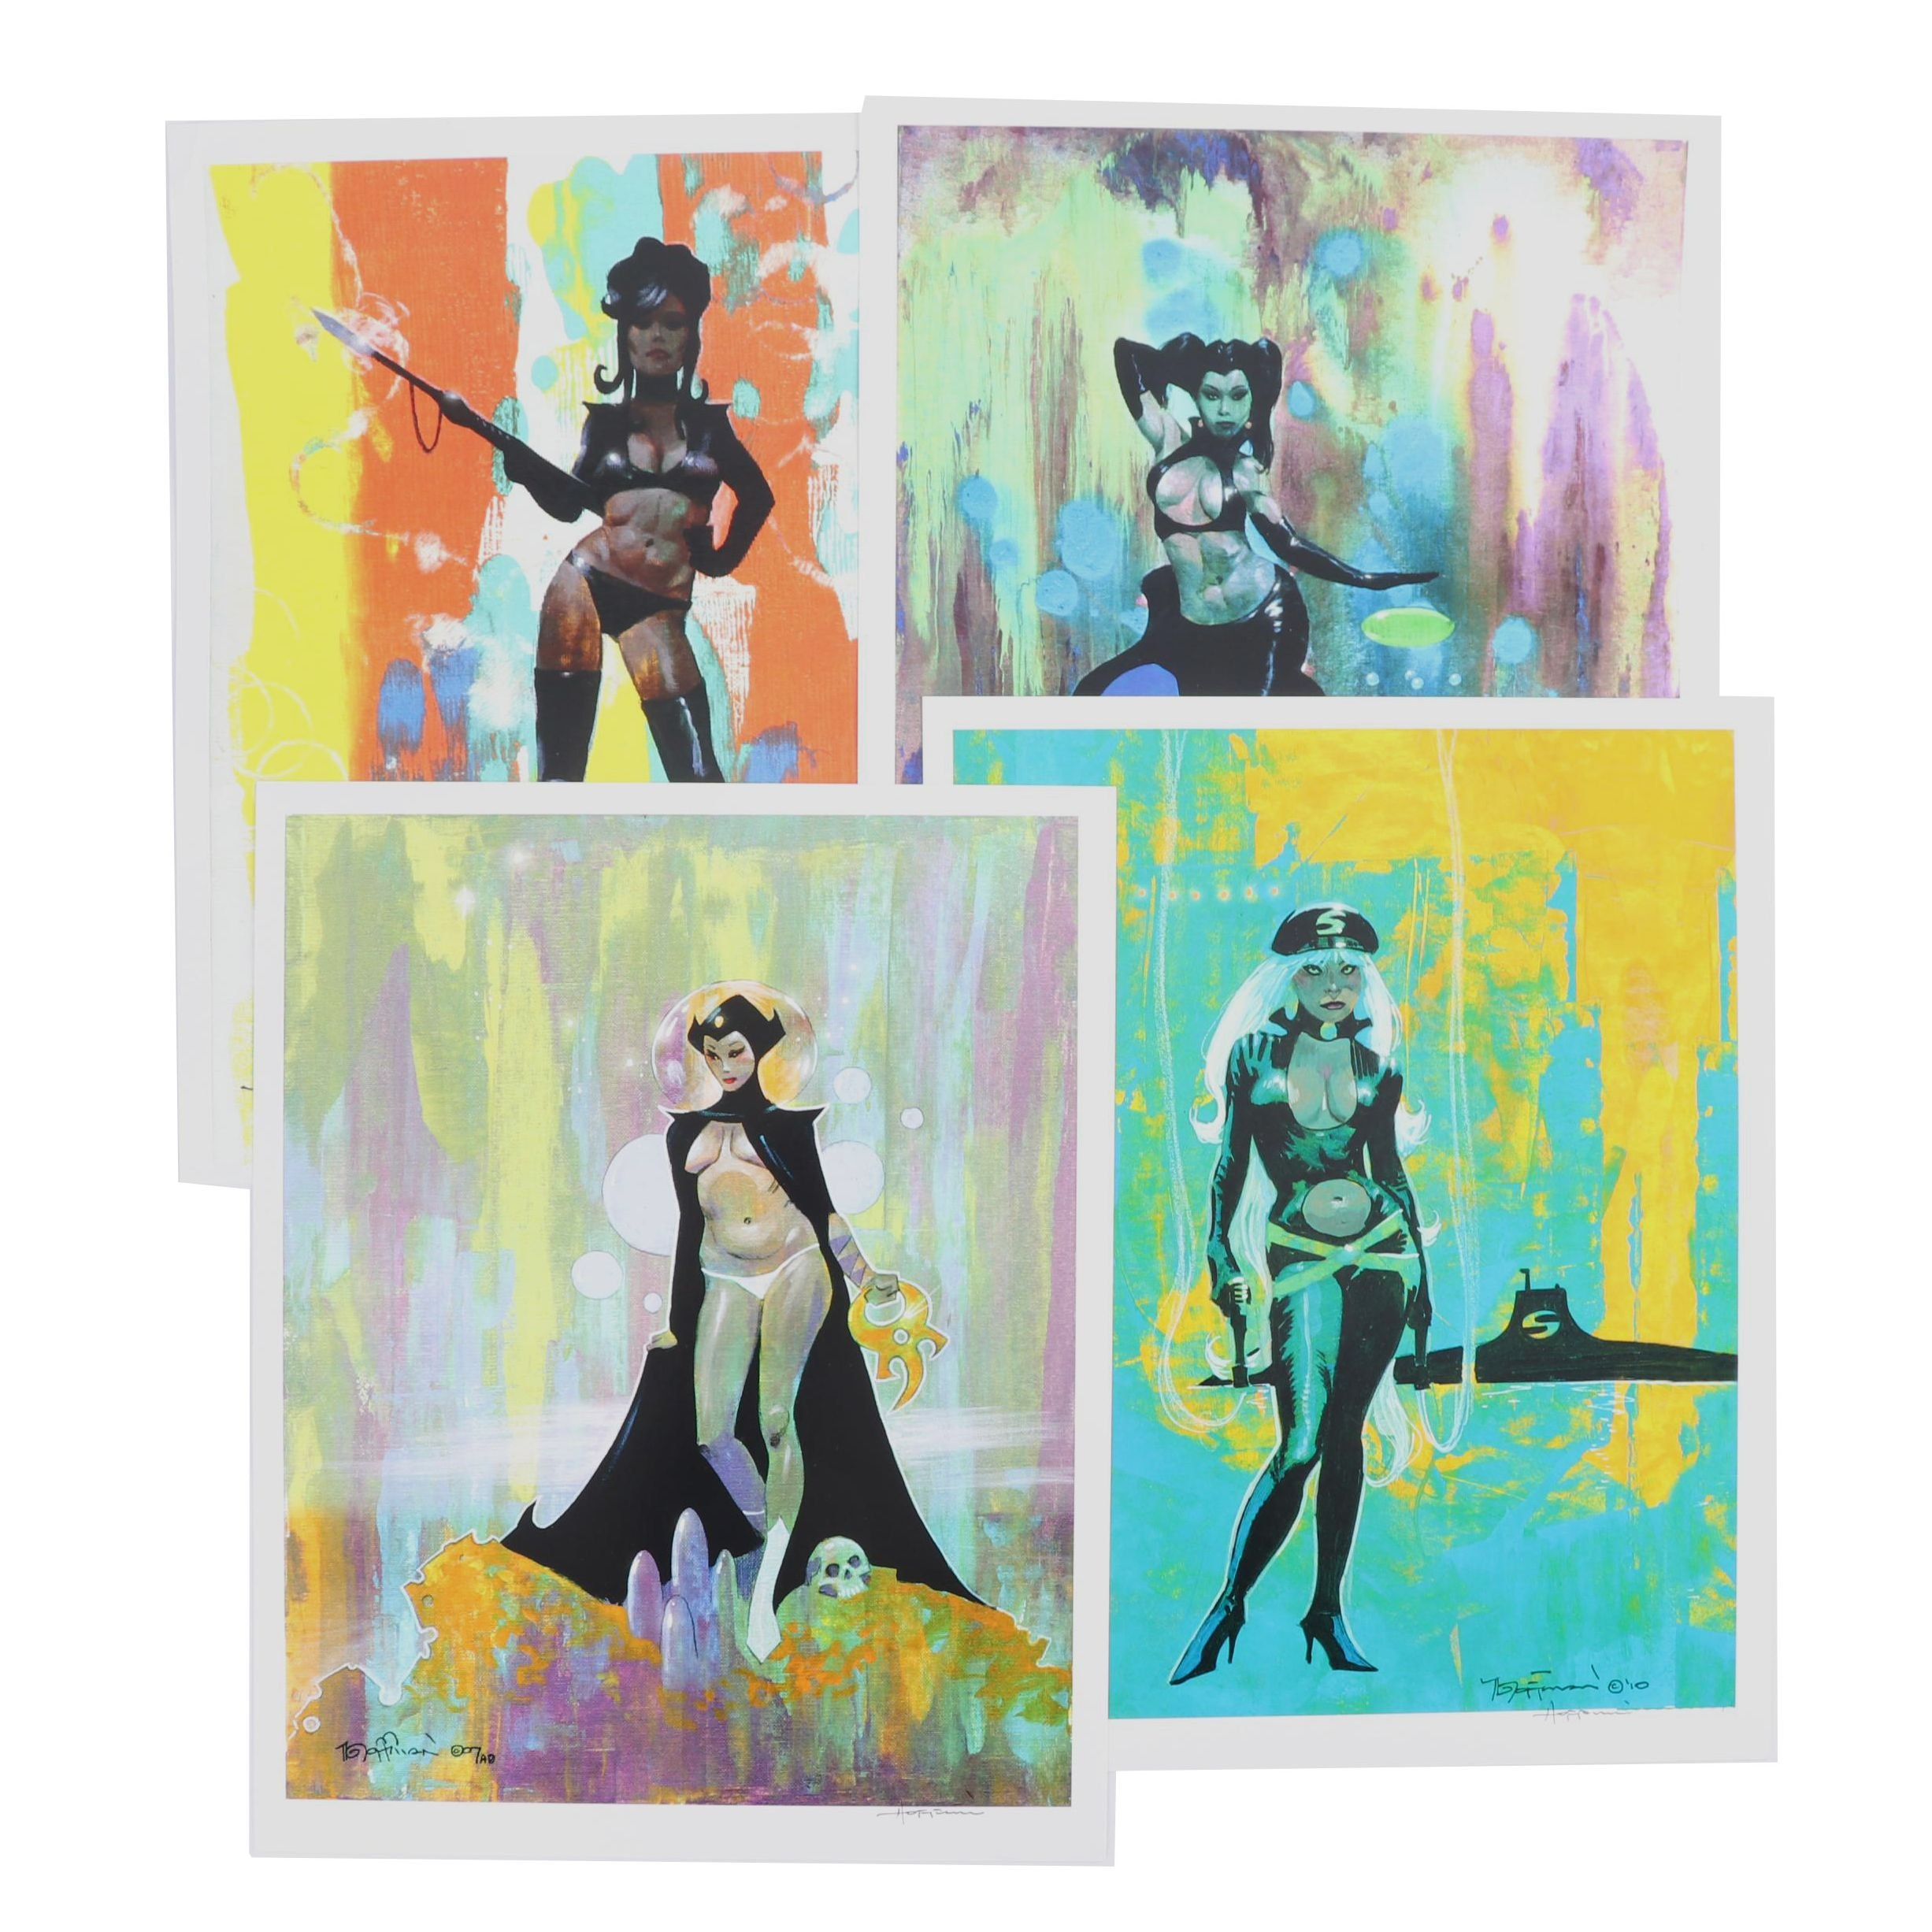 Fantasy Art Offset Lithographs after Mike Hoffman